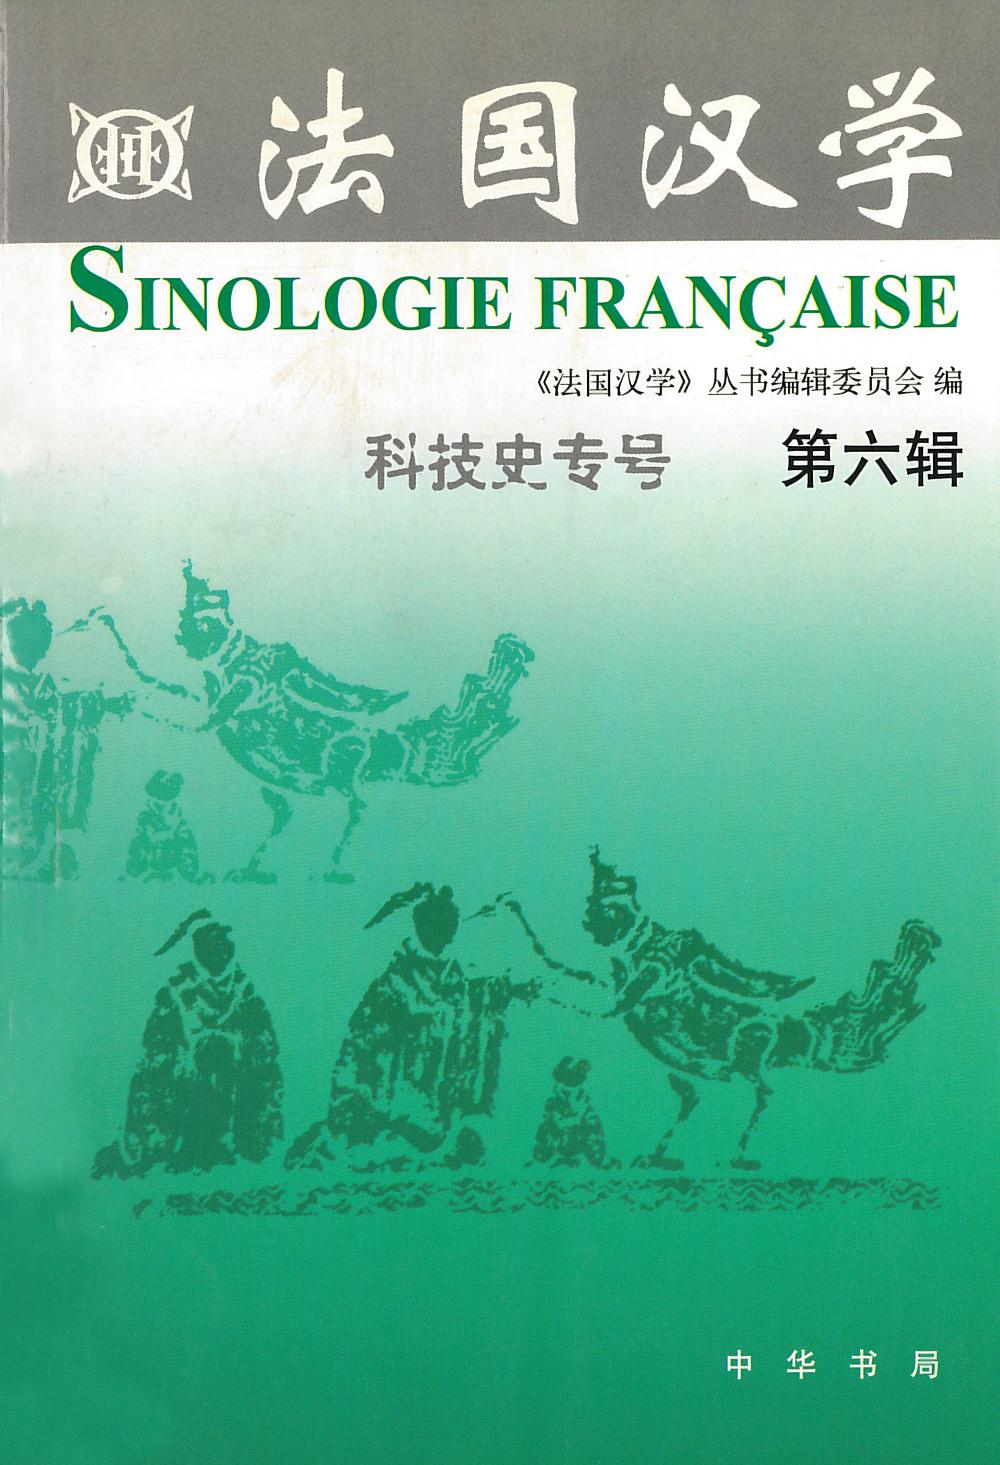 Faguo Hanxue [Sinologie française] 6